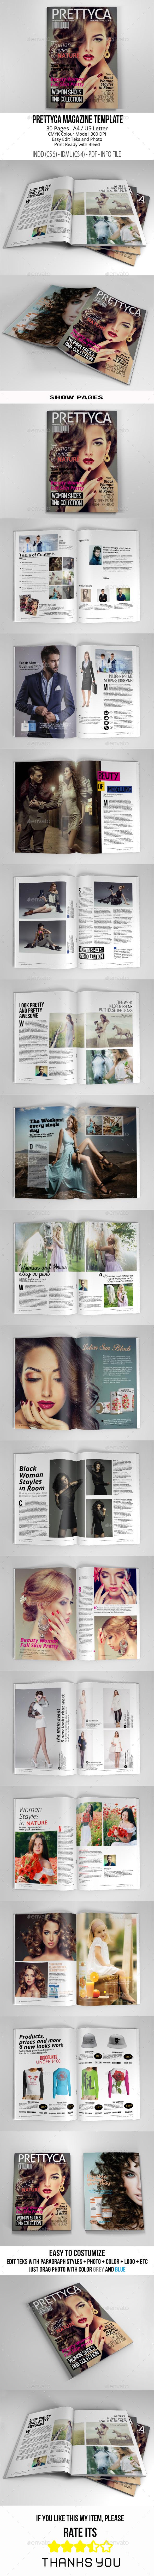 Prettyca Magazine Vol.2 A4/US Letter - Magazines Print Templates